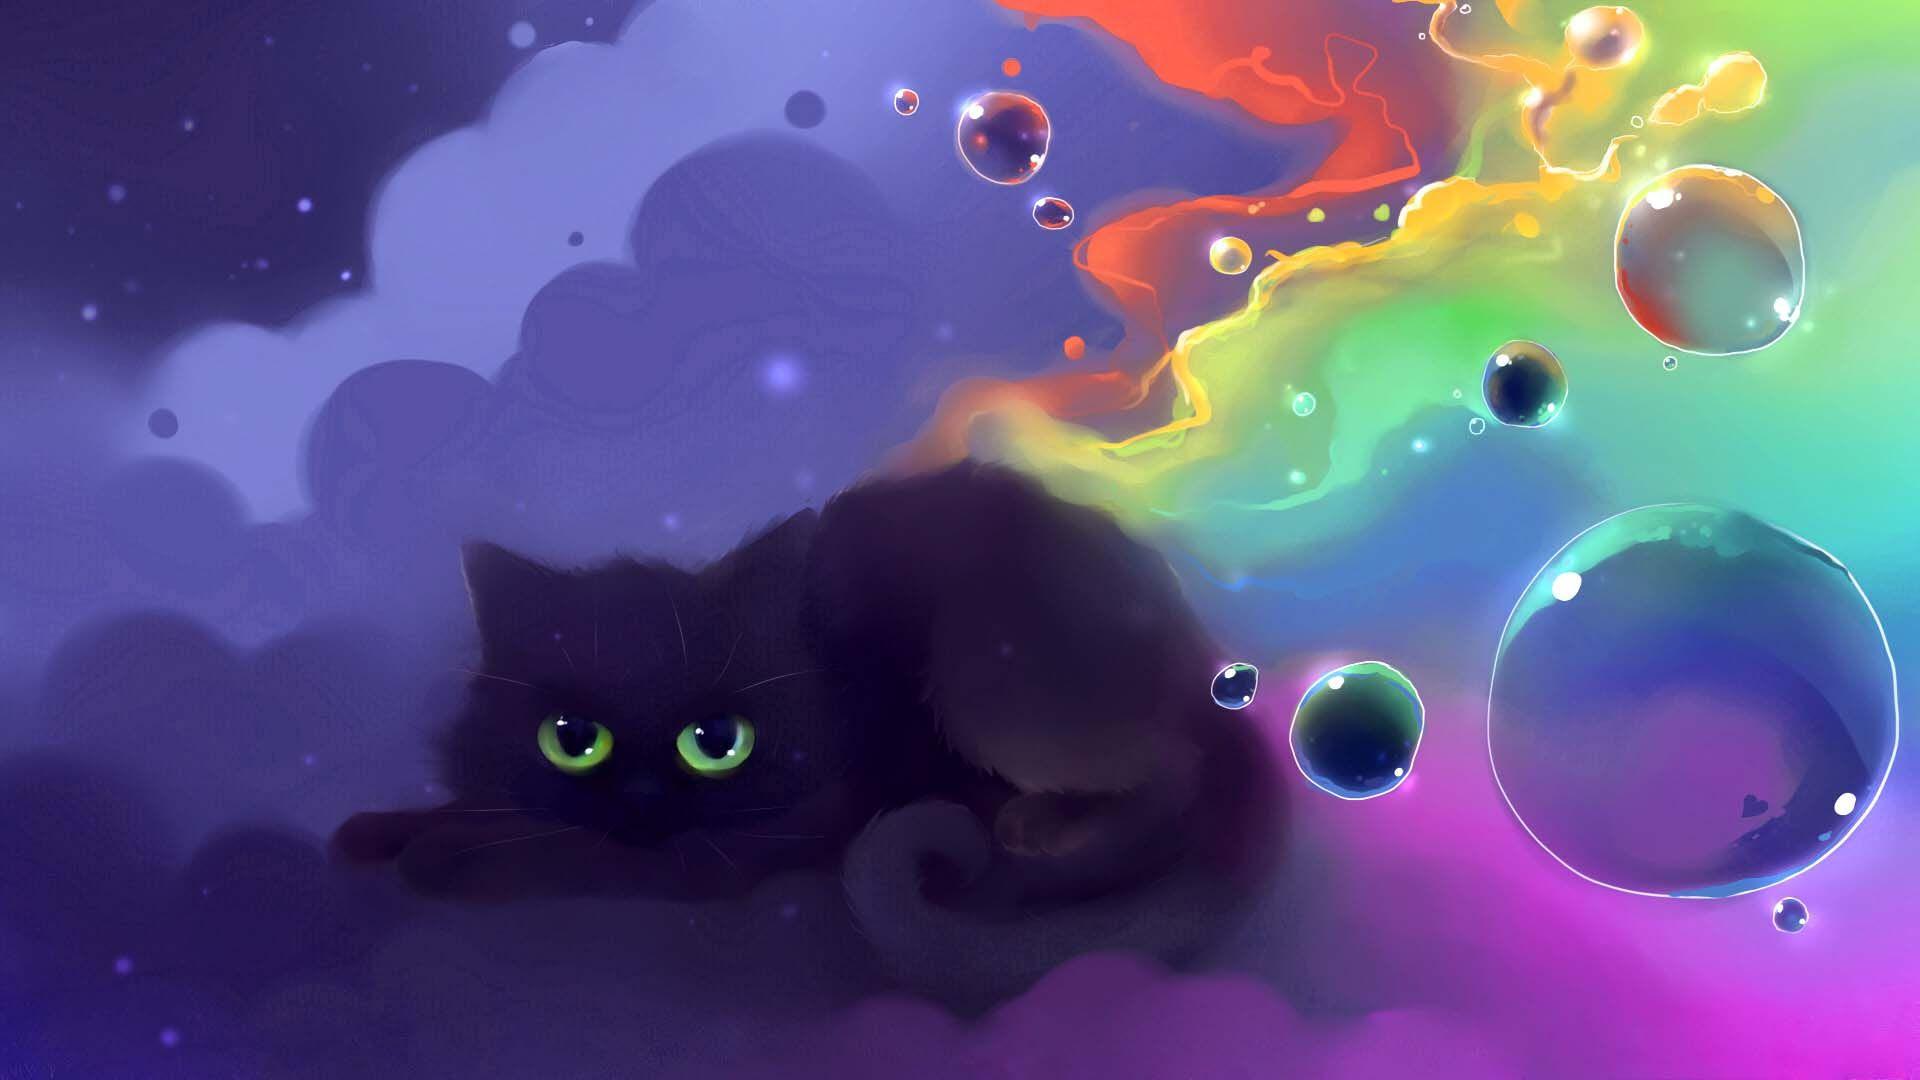 Kitty Cat Cartoon Wallpaper